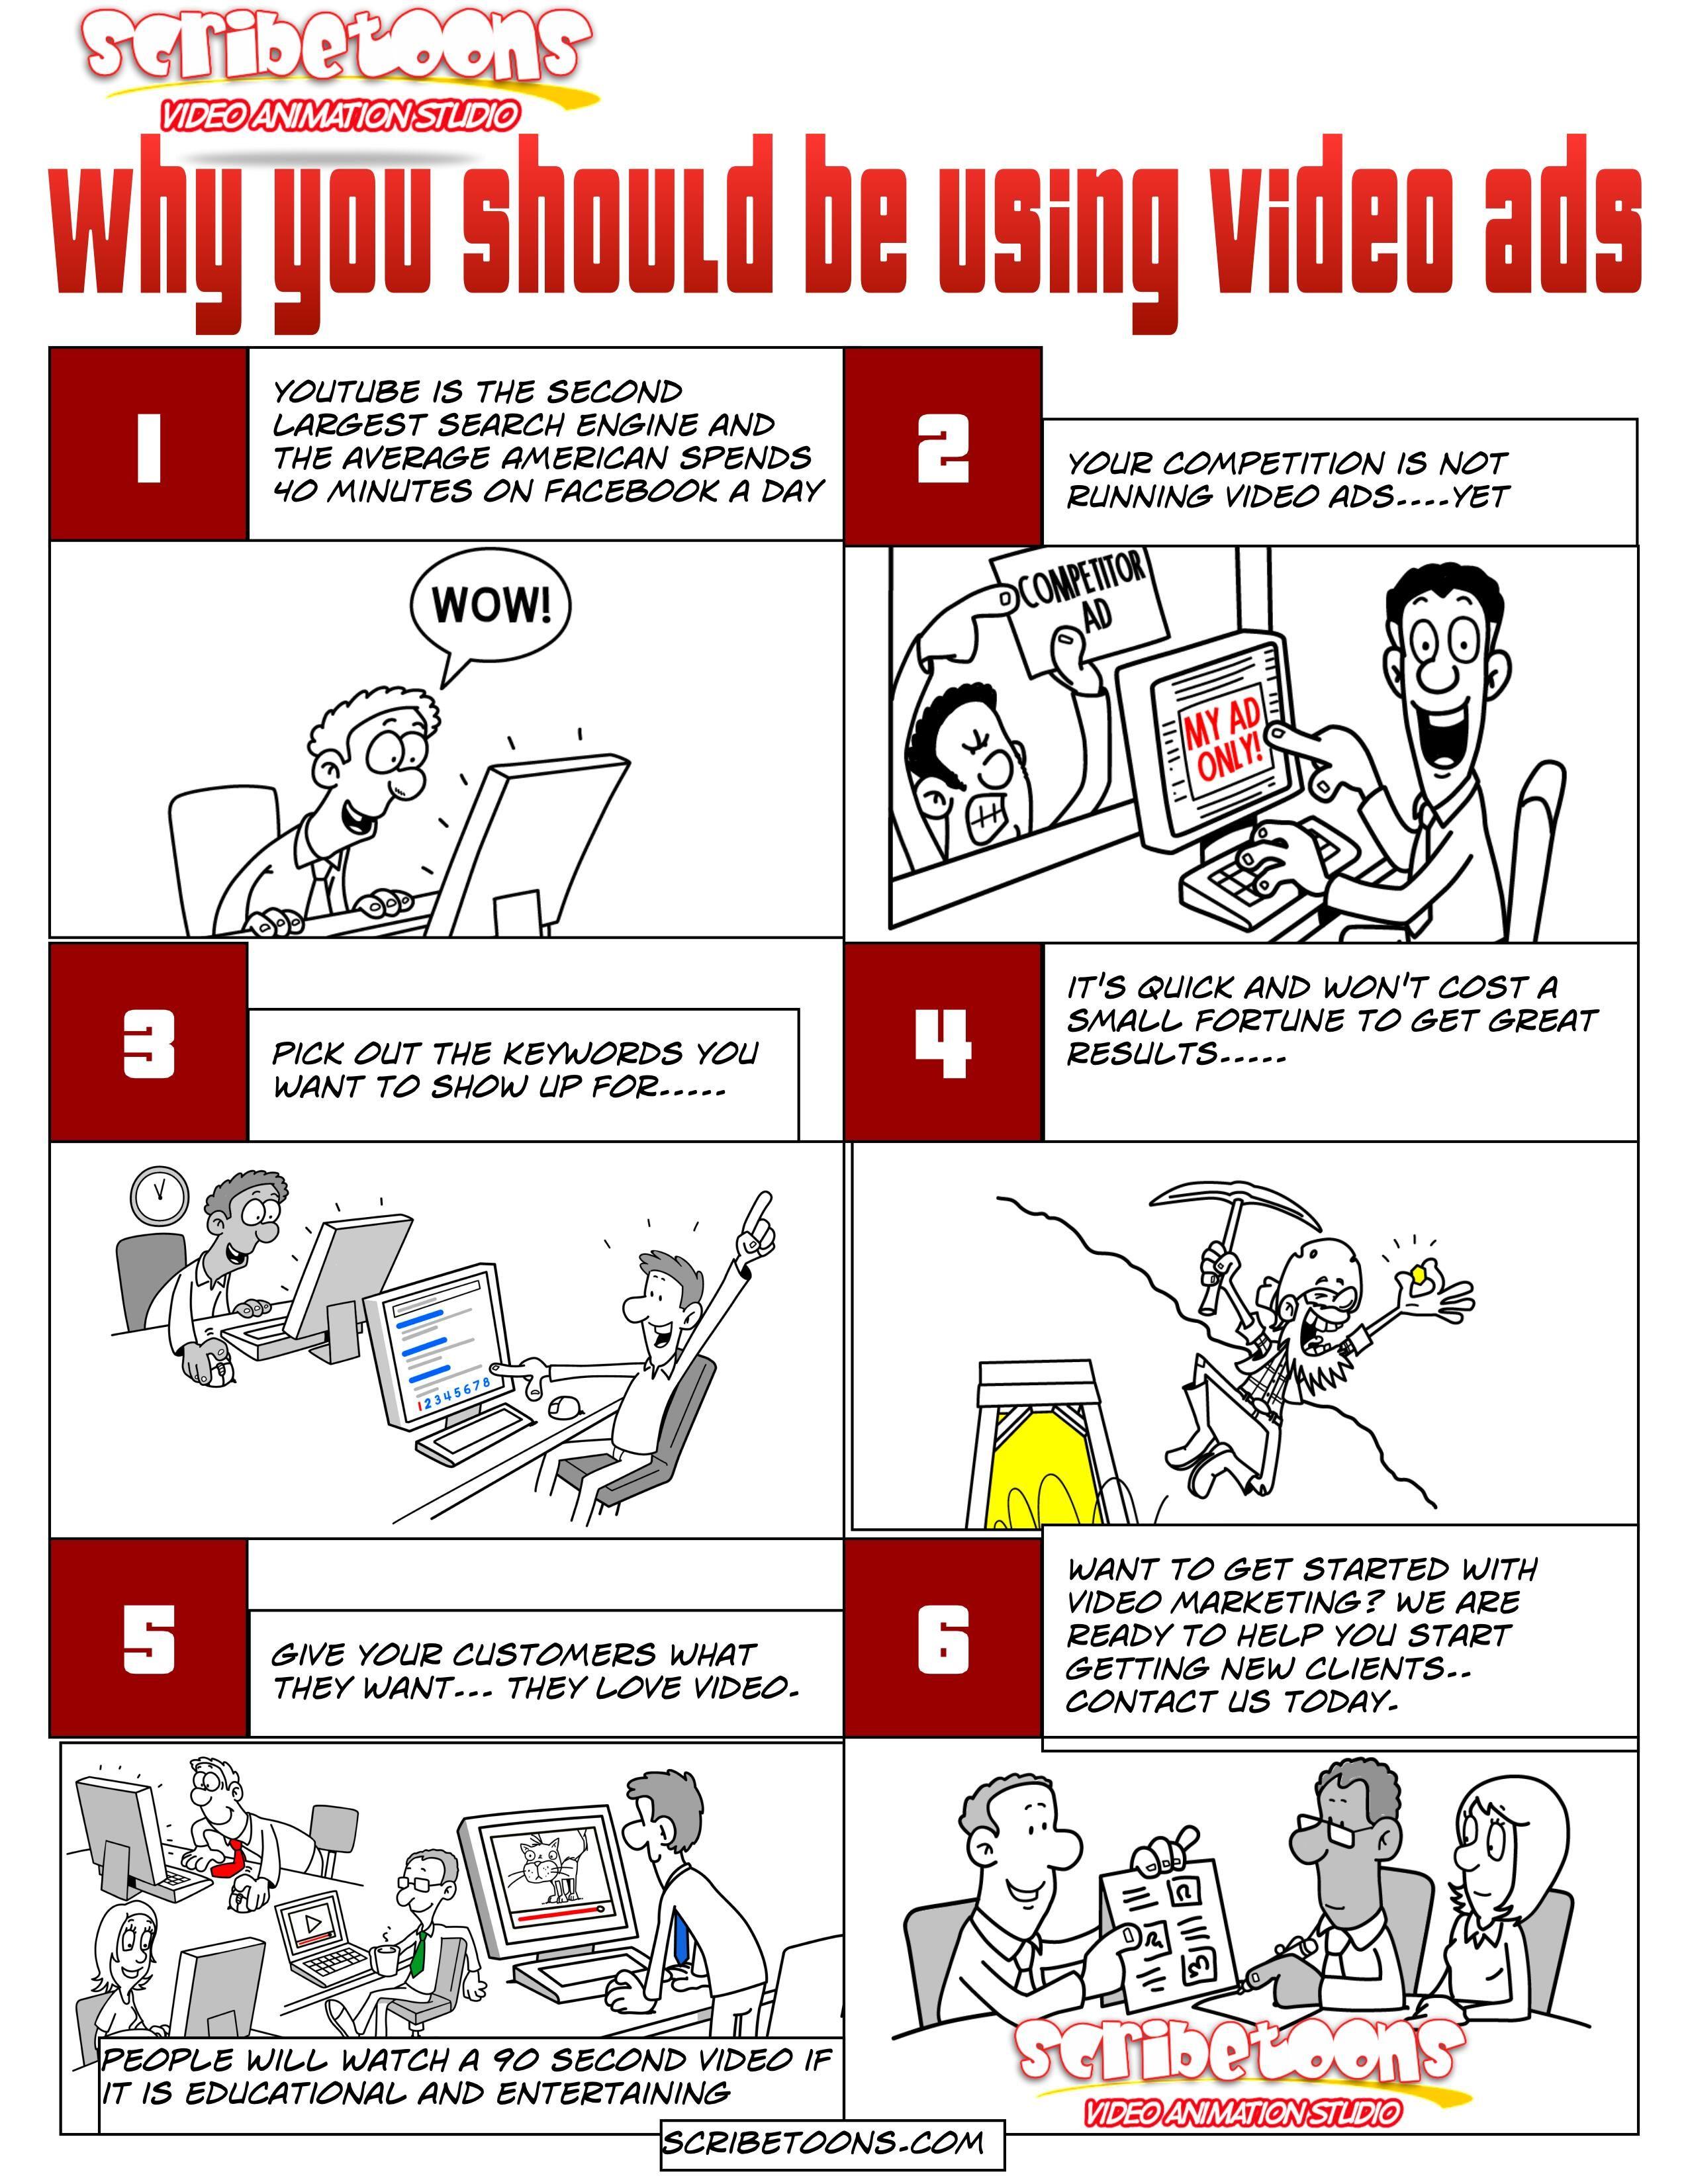 video ad marketing #running video ads #whiteboard animation studio